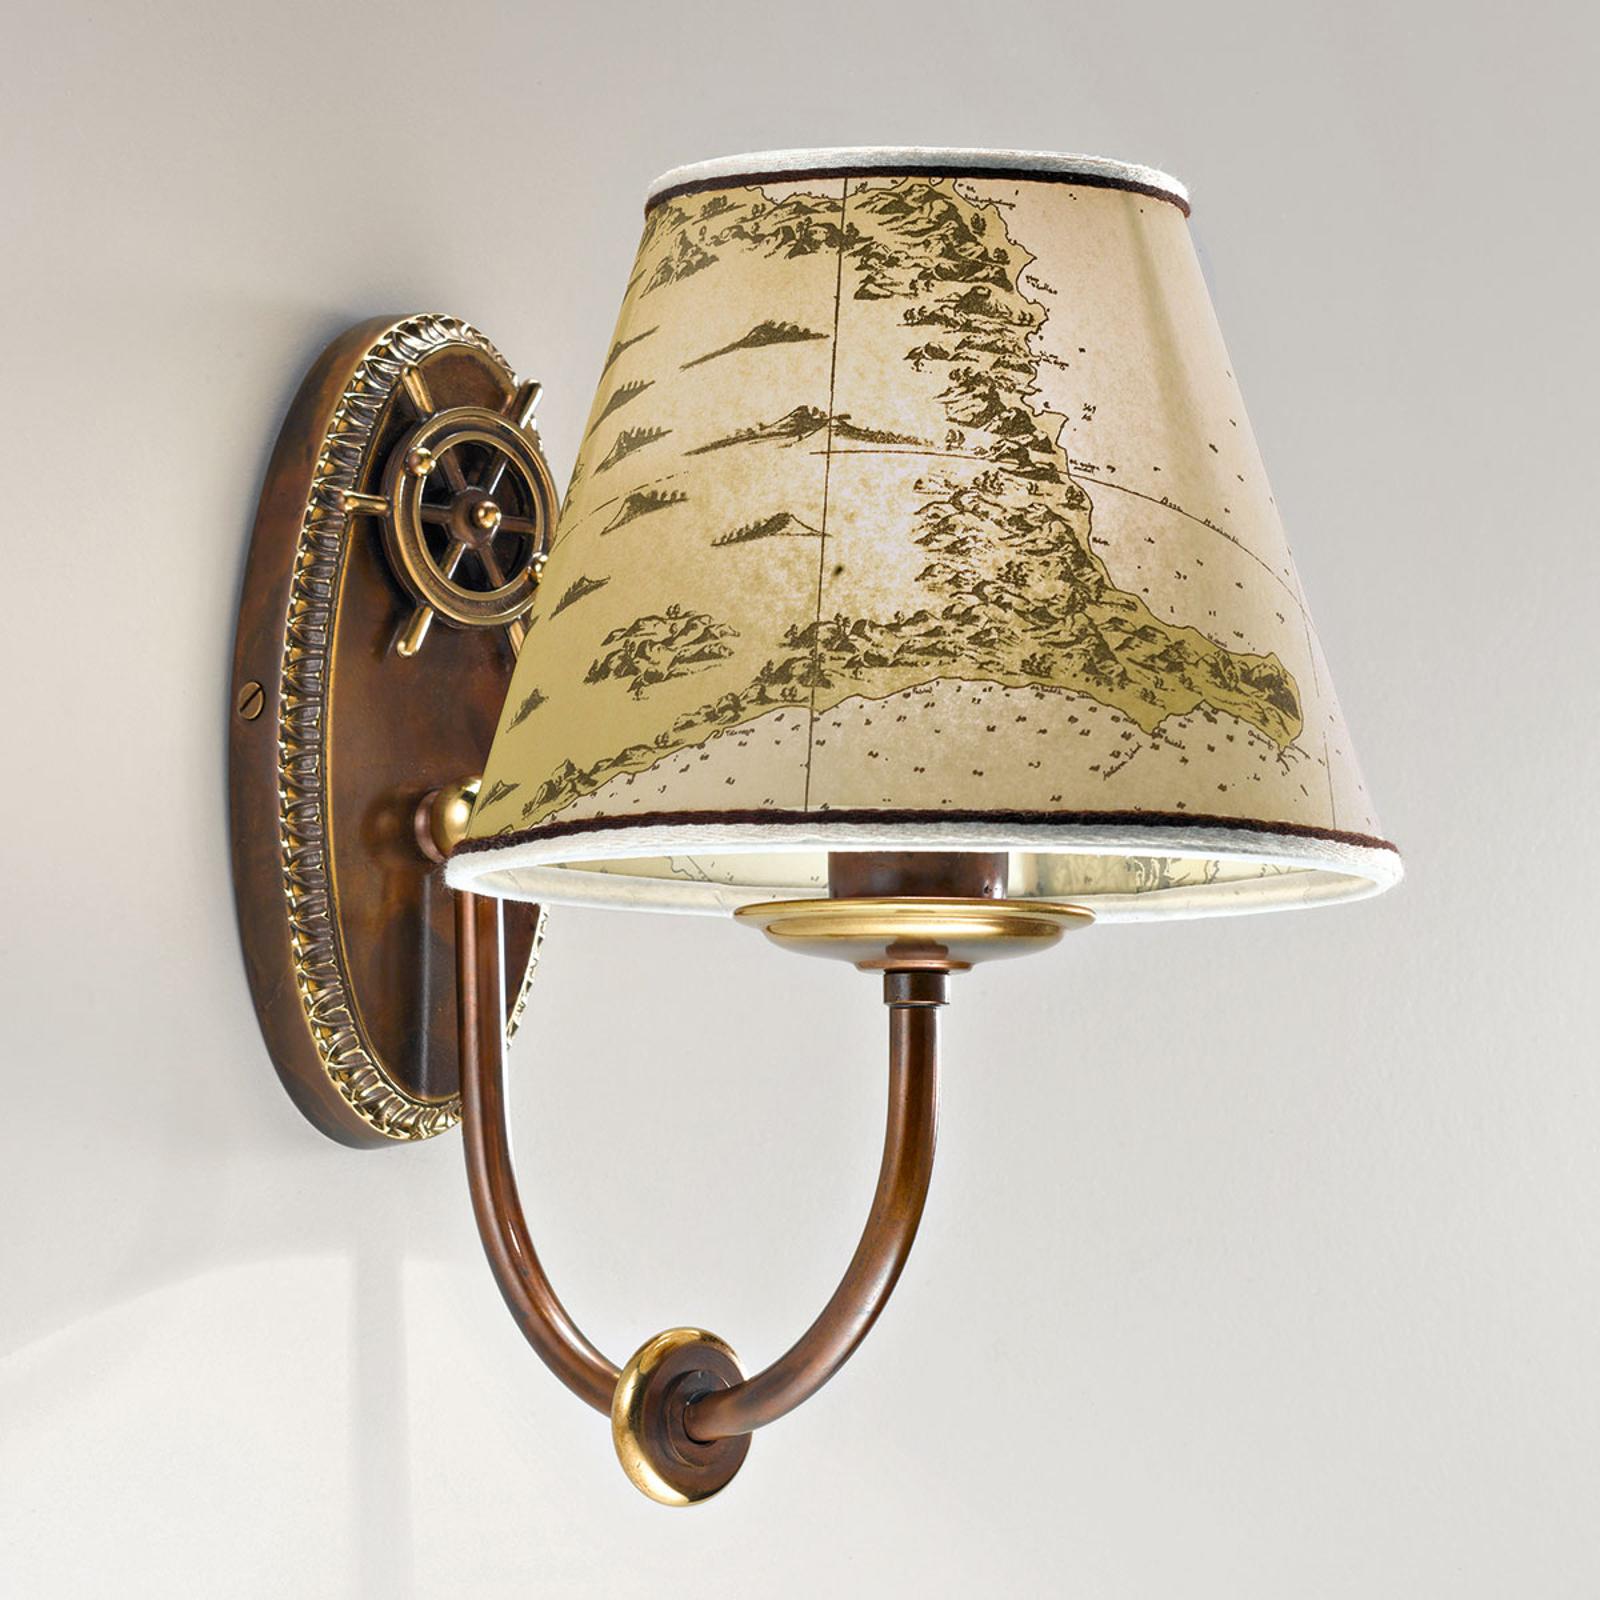 Vägglampa Nautica i maritim stil, enarmad, 25 cm